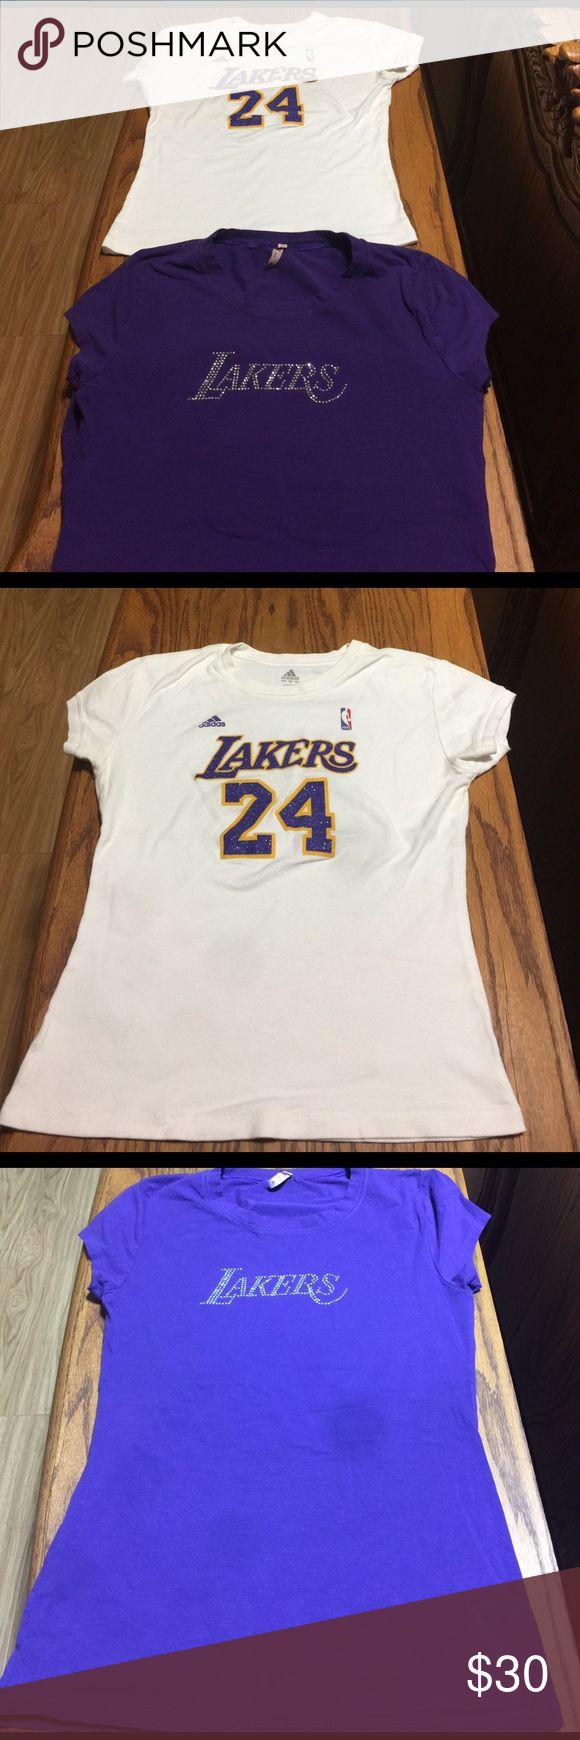 Two  NBA t-shirts at retired now Laker Kobe Bryant woman tees Adidas Tops Tees - Short Sleeve